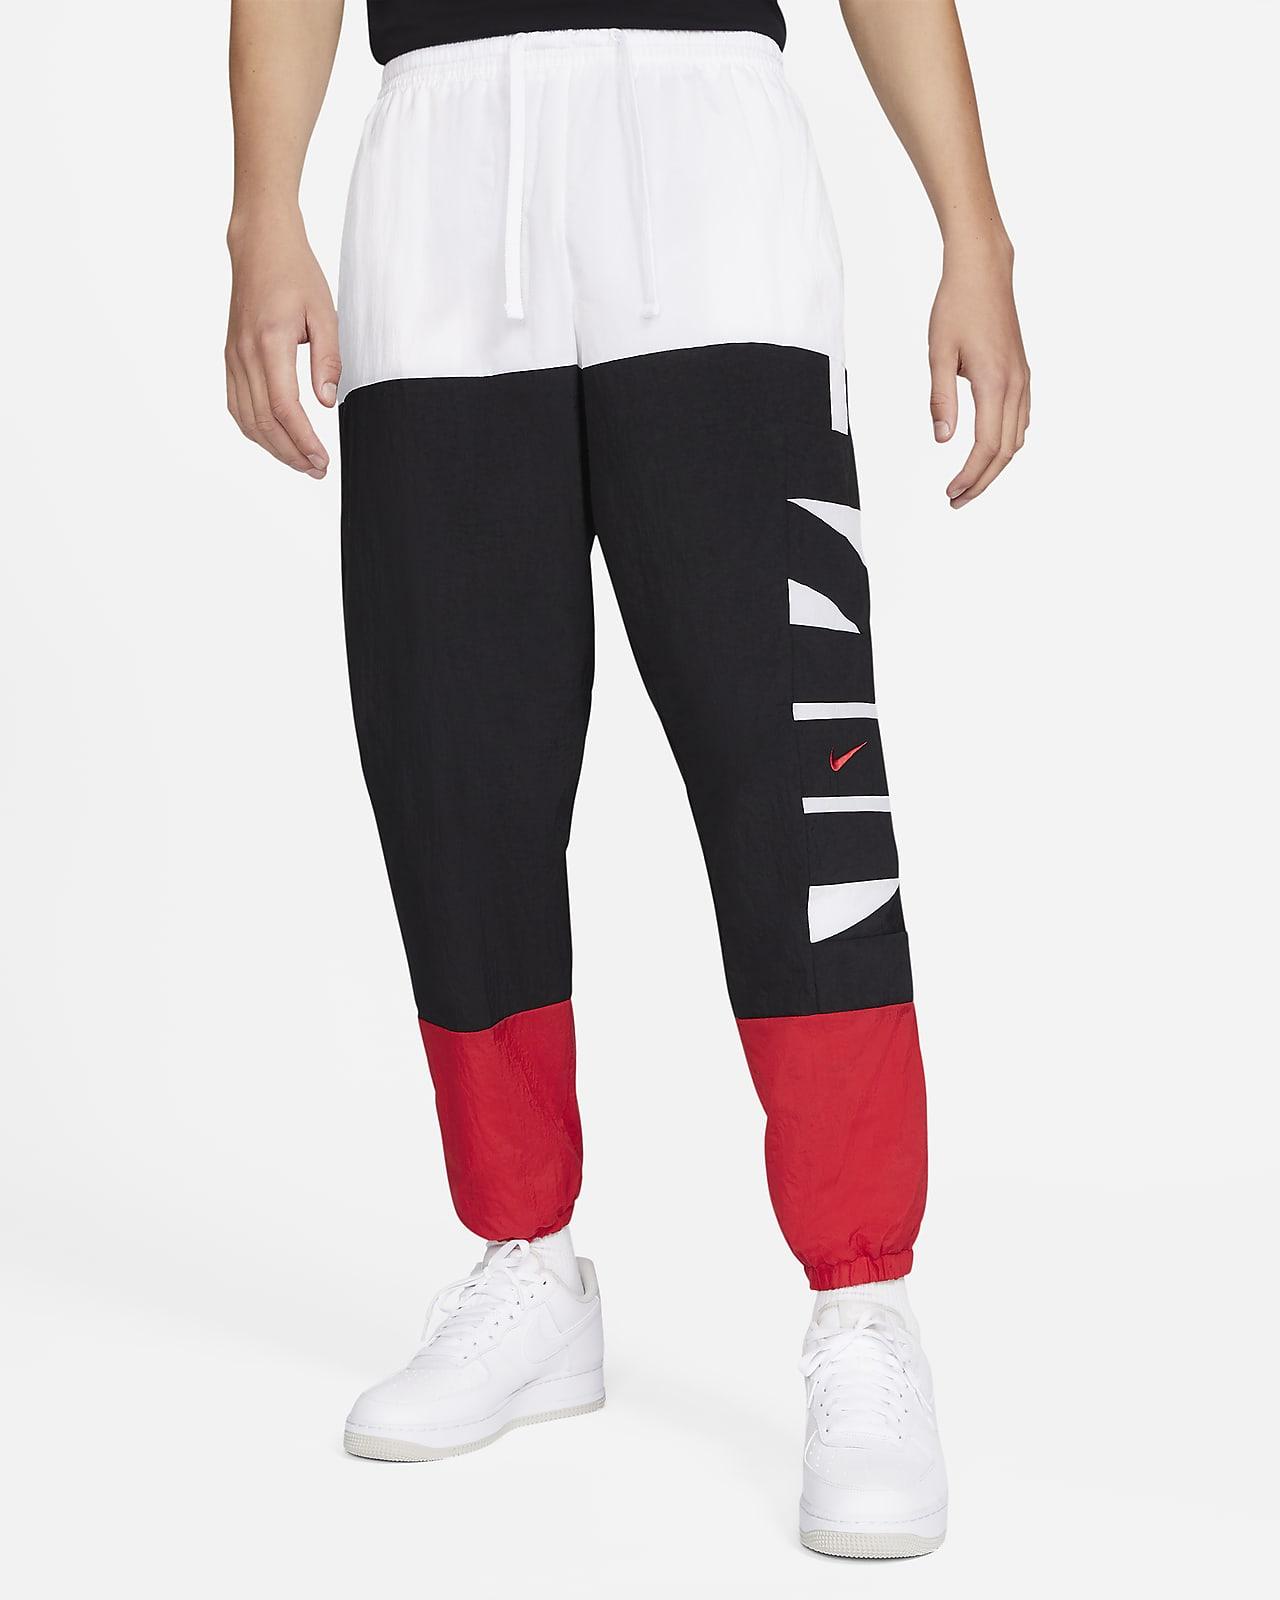 Nike Dri Fit Men S Basketball Trousers Nike Gb